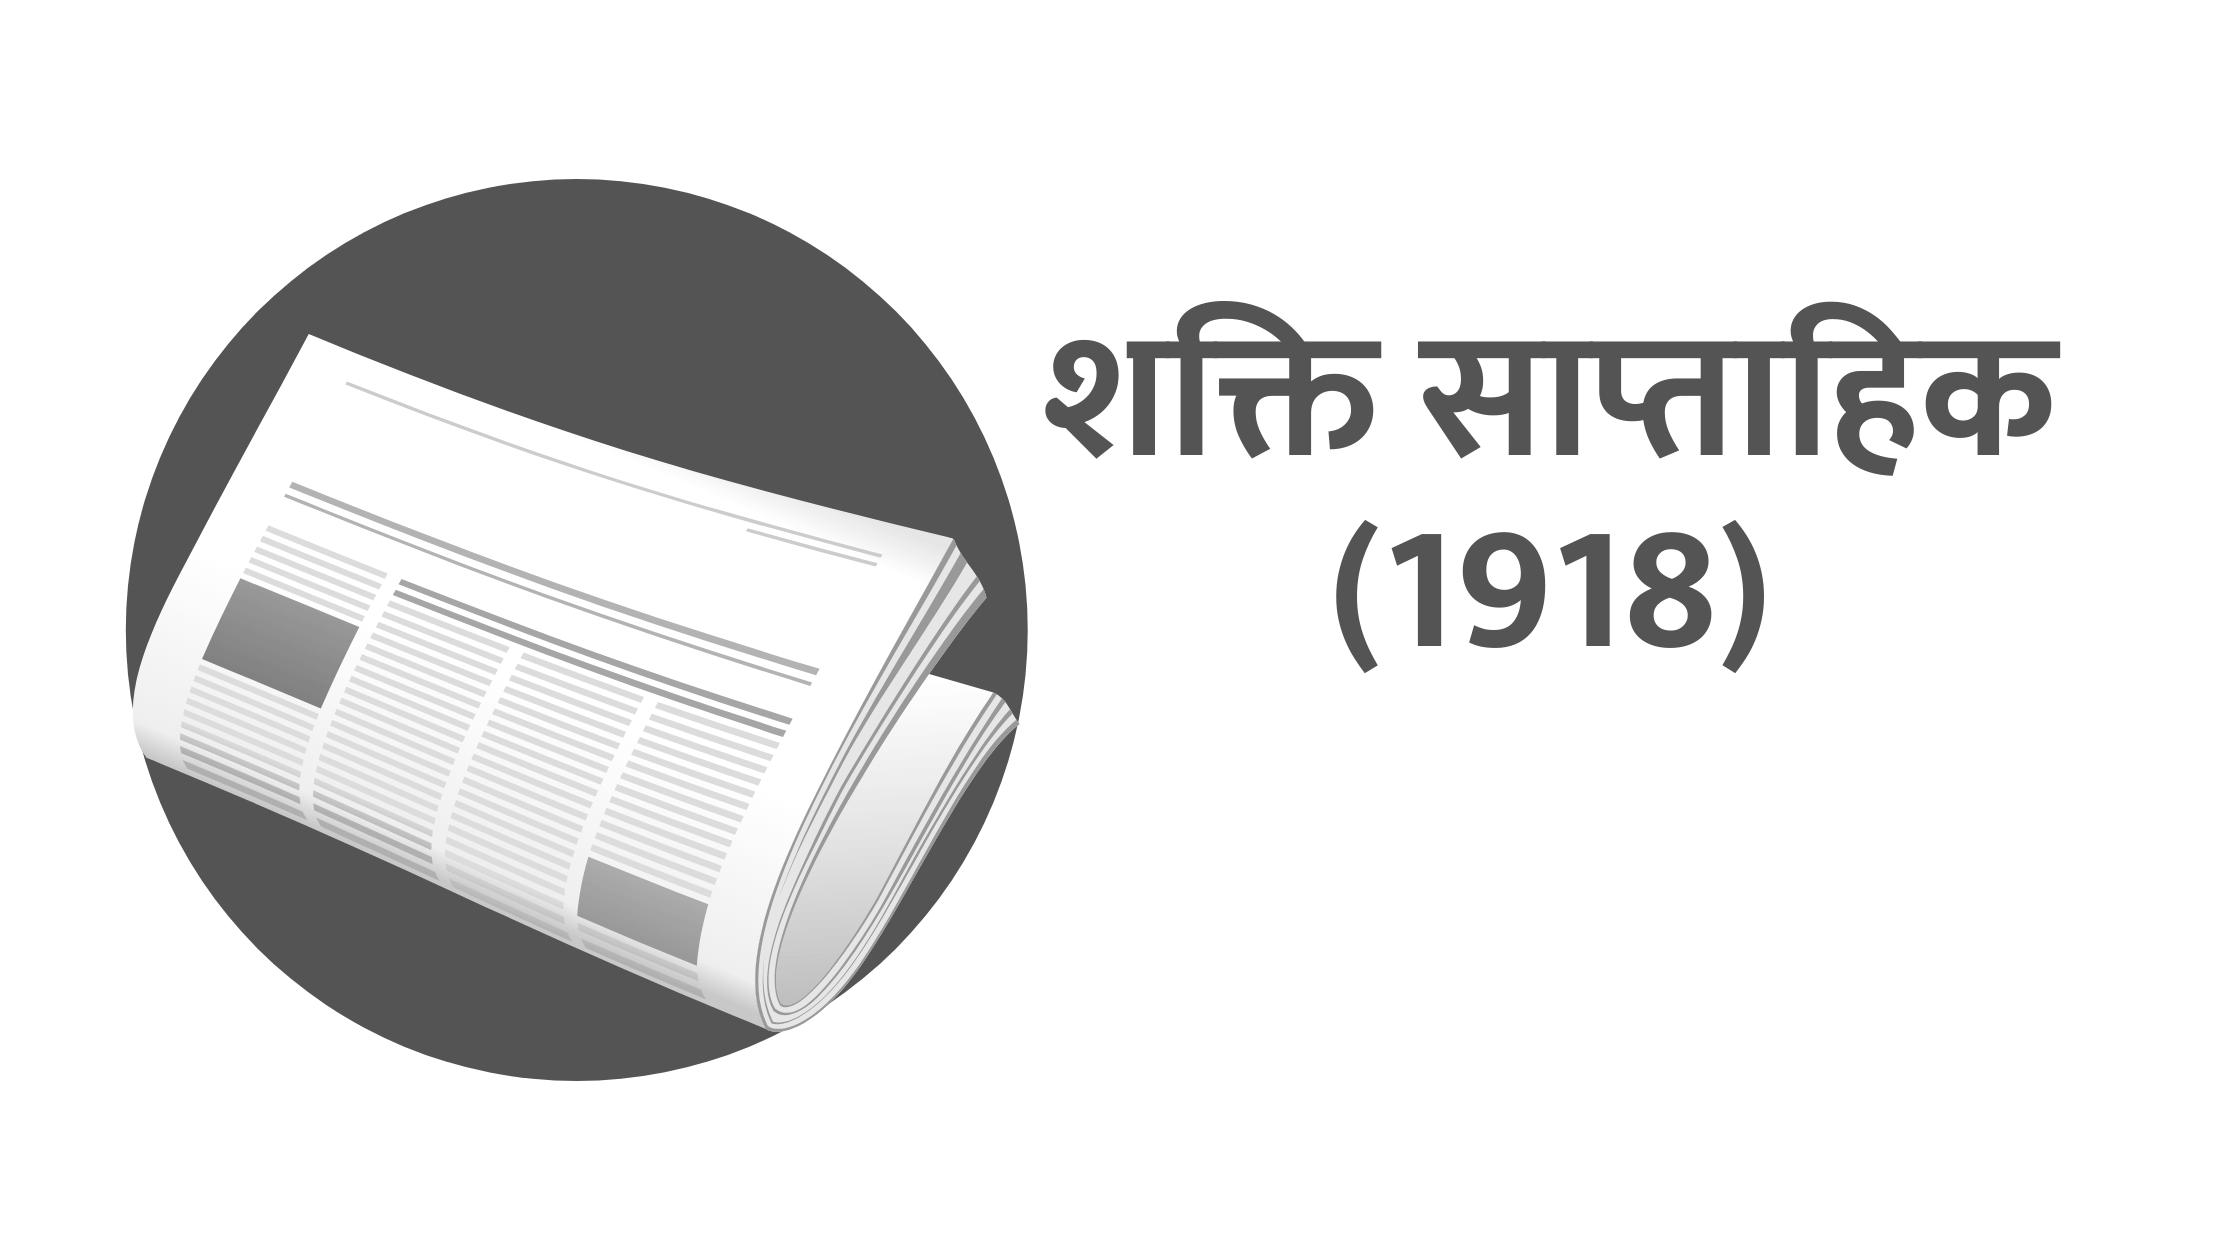 शक्ति साप्ताहिक (1918)